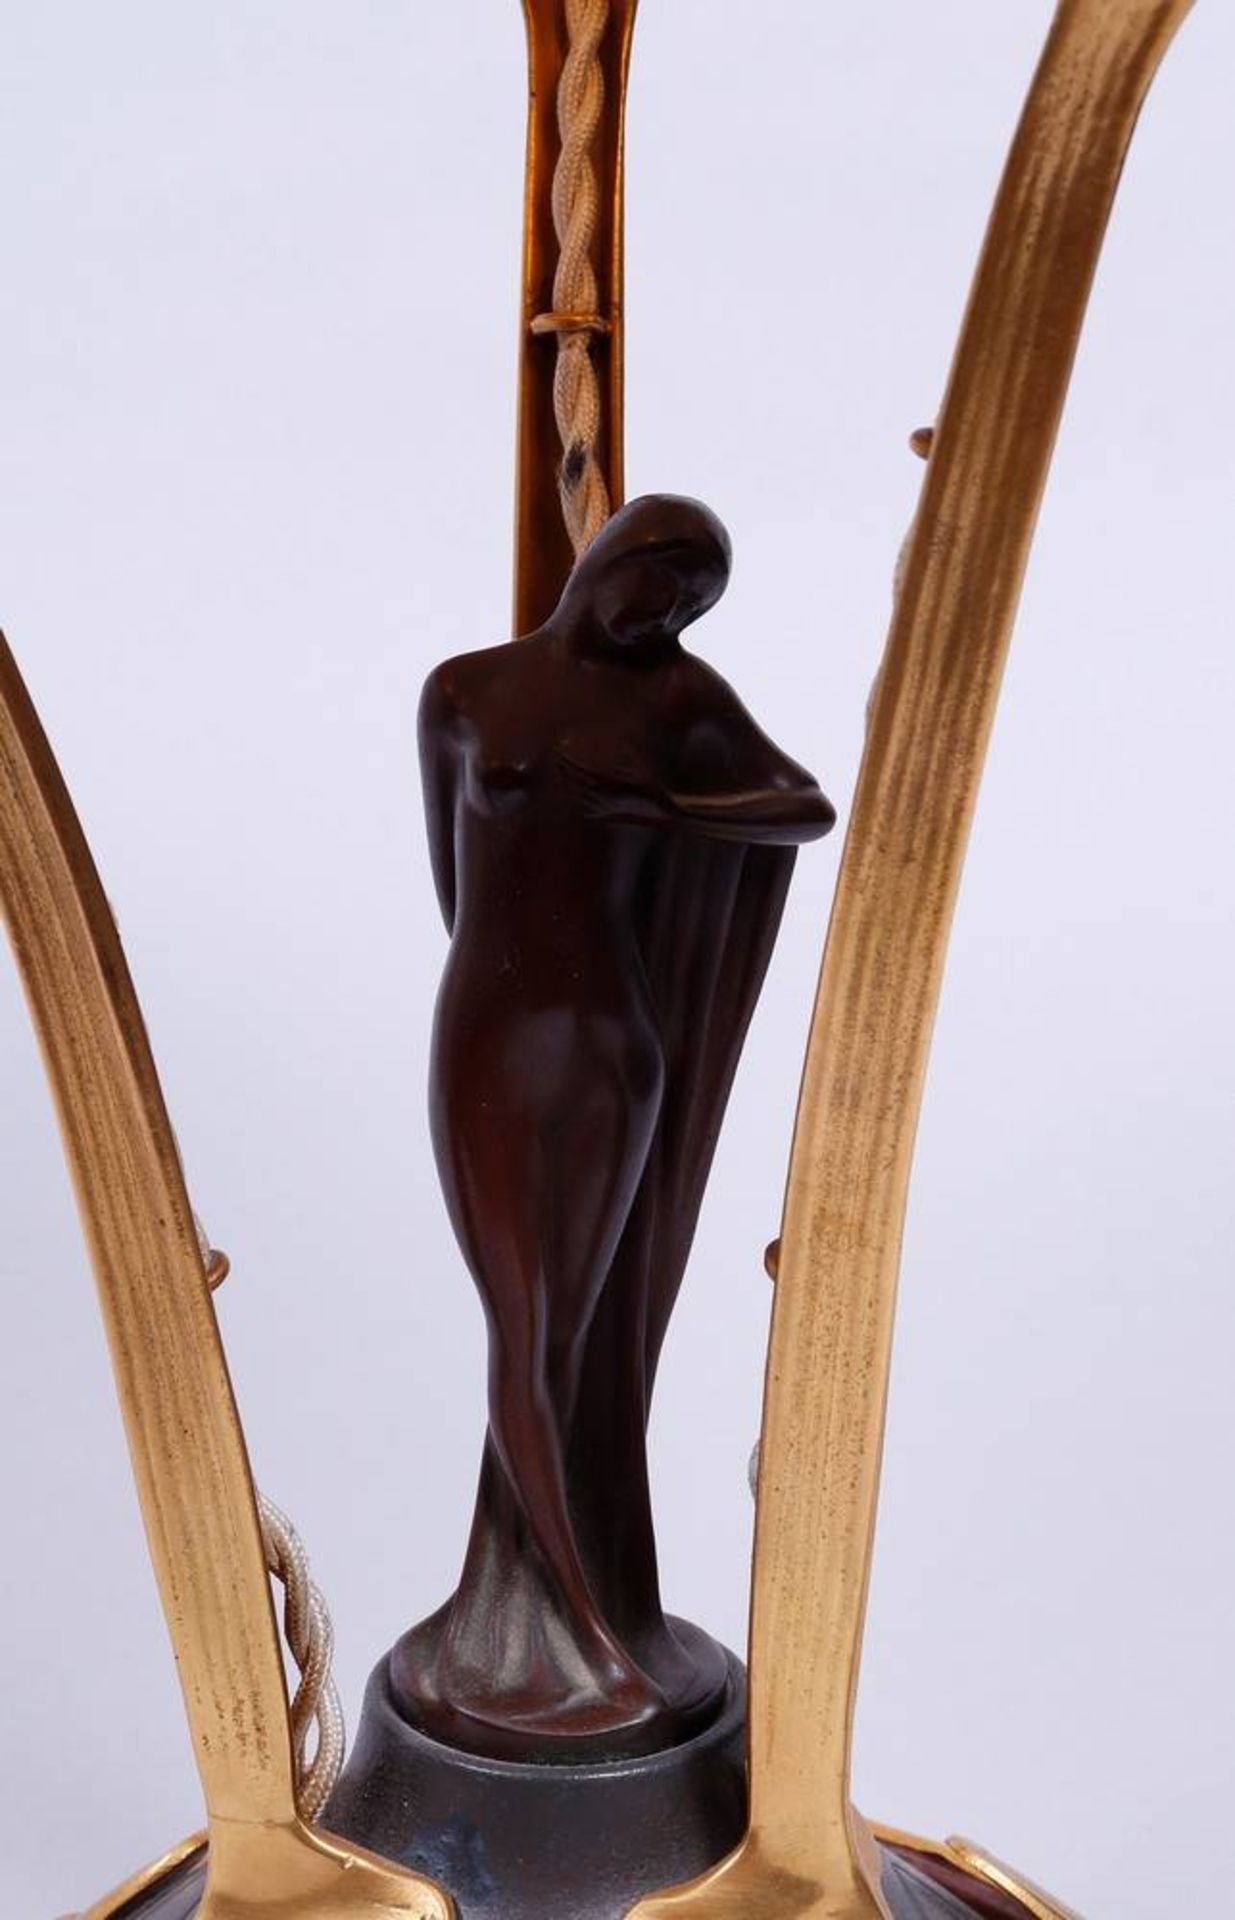 Art Nouveau table lamp, probably Loetz, 1st half 20th C. - Image 3 of 6